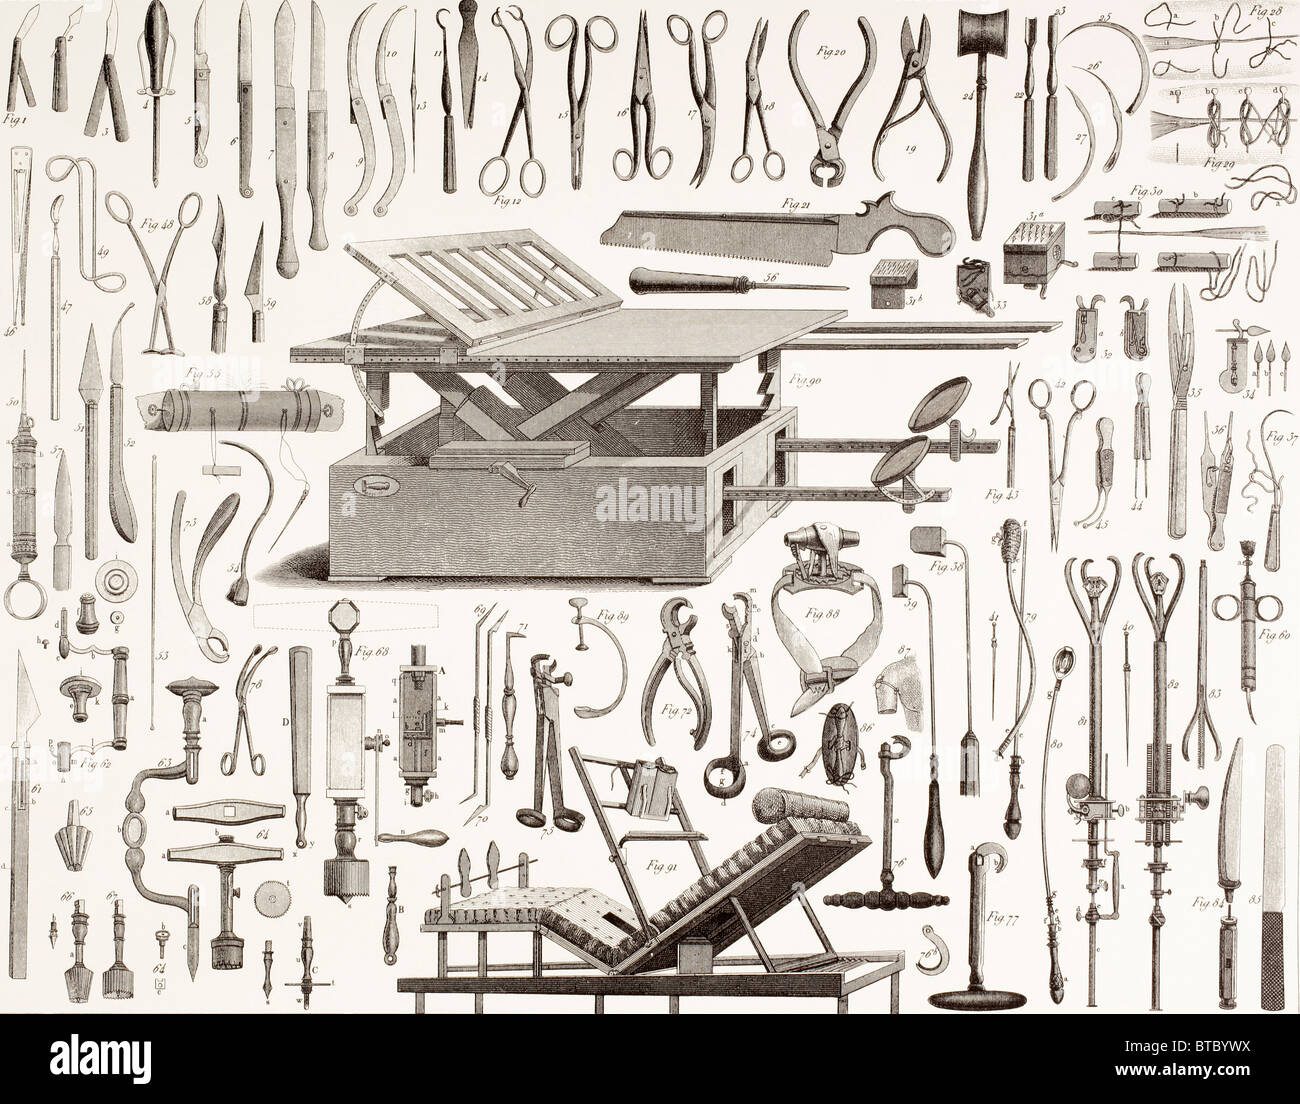 19e siècle les instruments chirurgicaux. Photo Stock